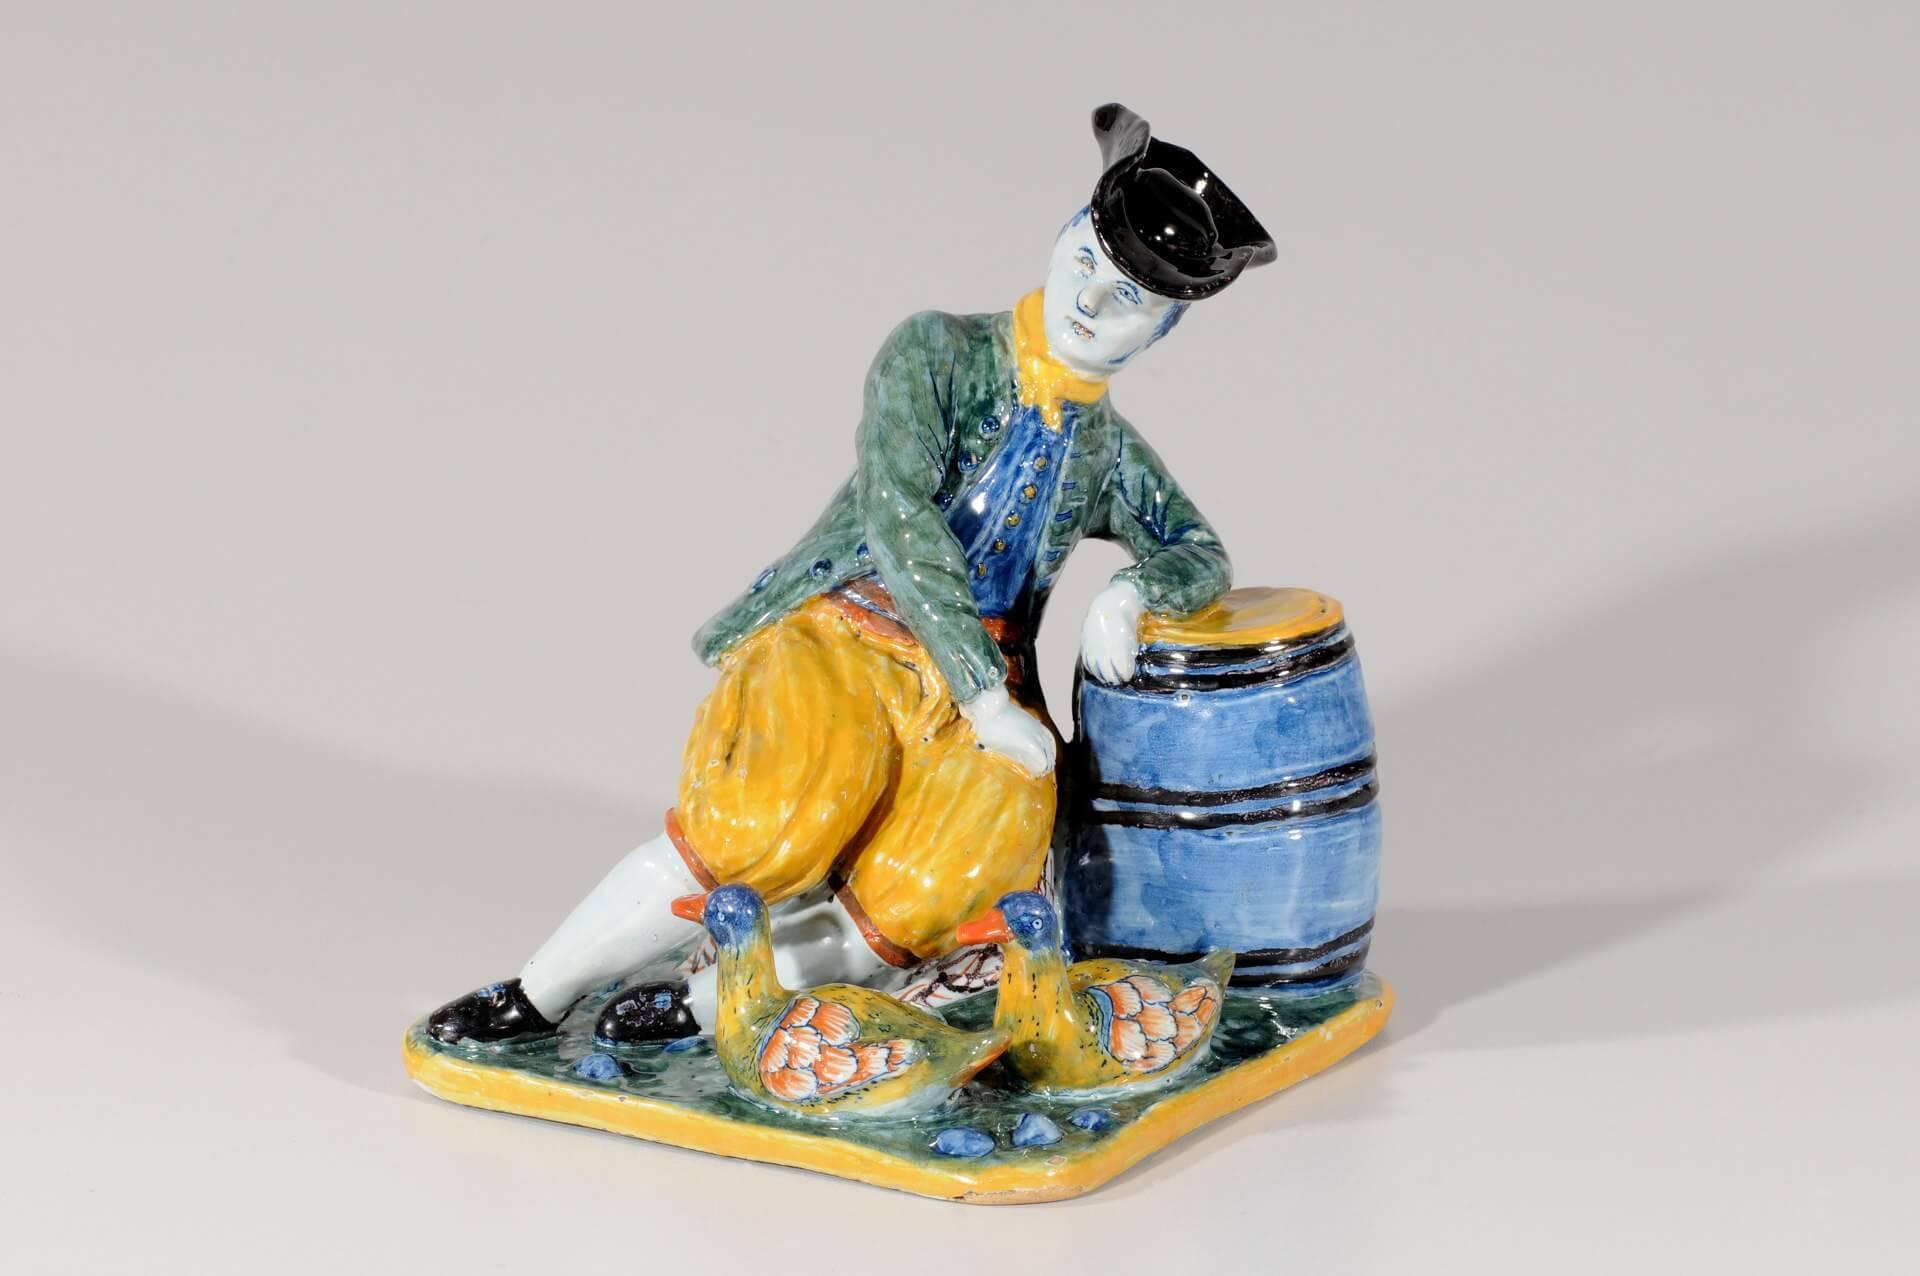 Antique polychrome figurine of man hanging on barrel